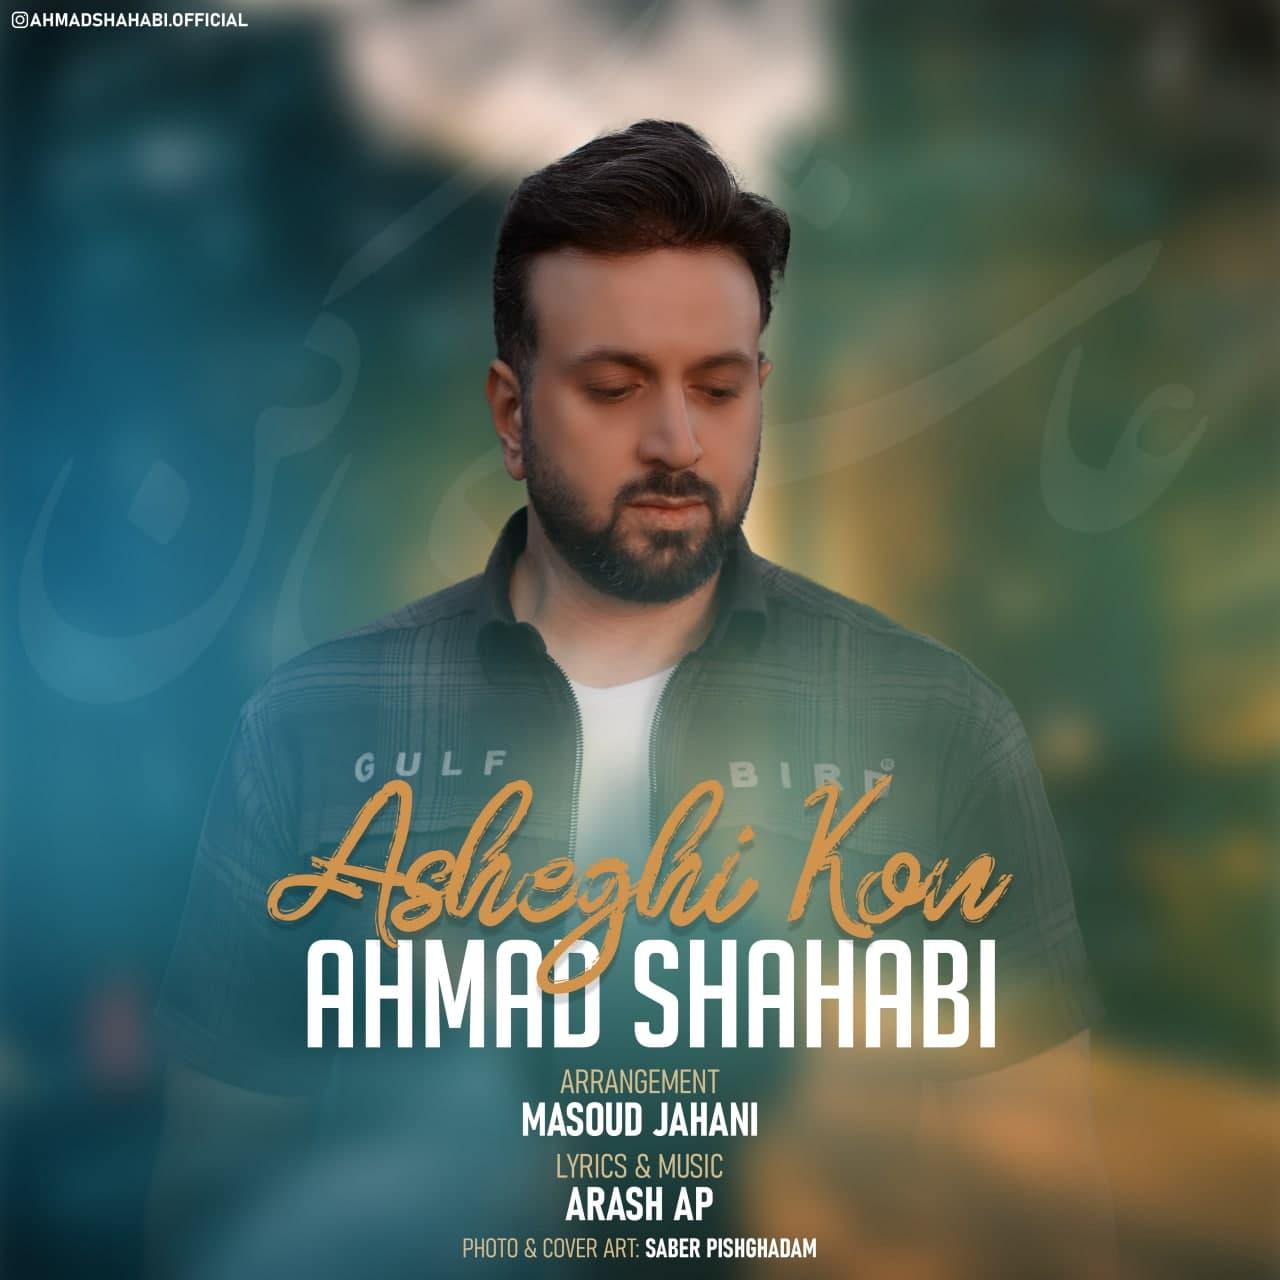 Download Ahang احمد شهابی عاشقی کن